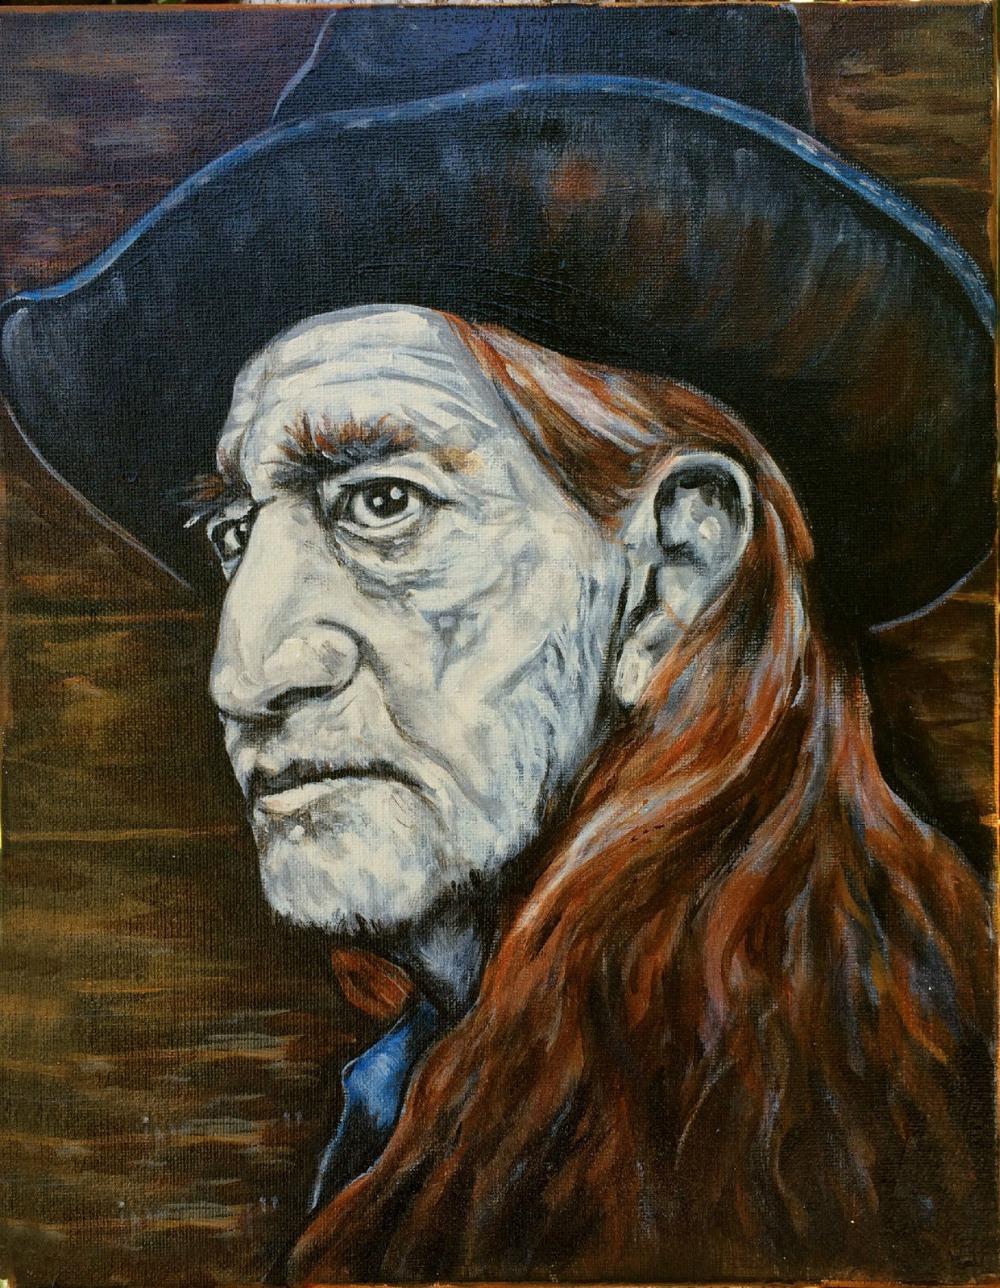 POP art oil painting-Willie Nelson Texas Mojo Blues original Guitar Folk Art --100% hand painted 24x20 inch-free shipping(China (Mainland))